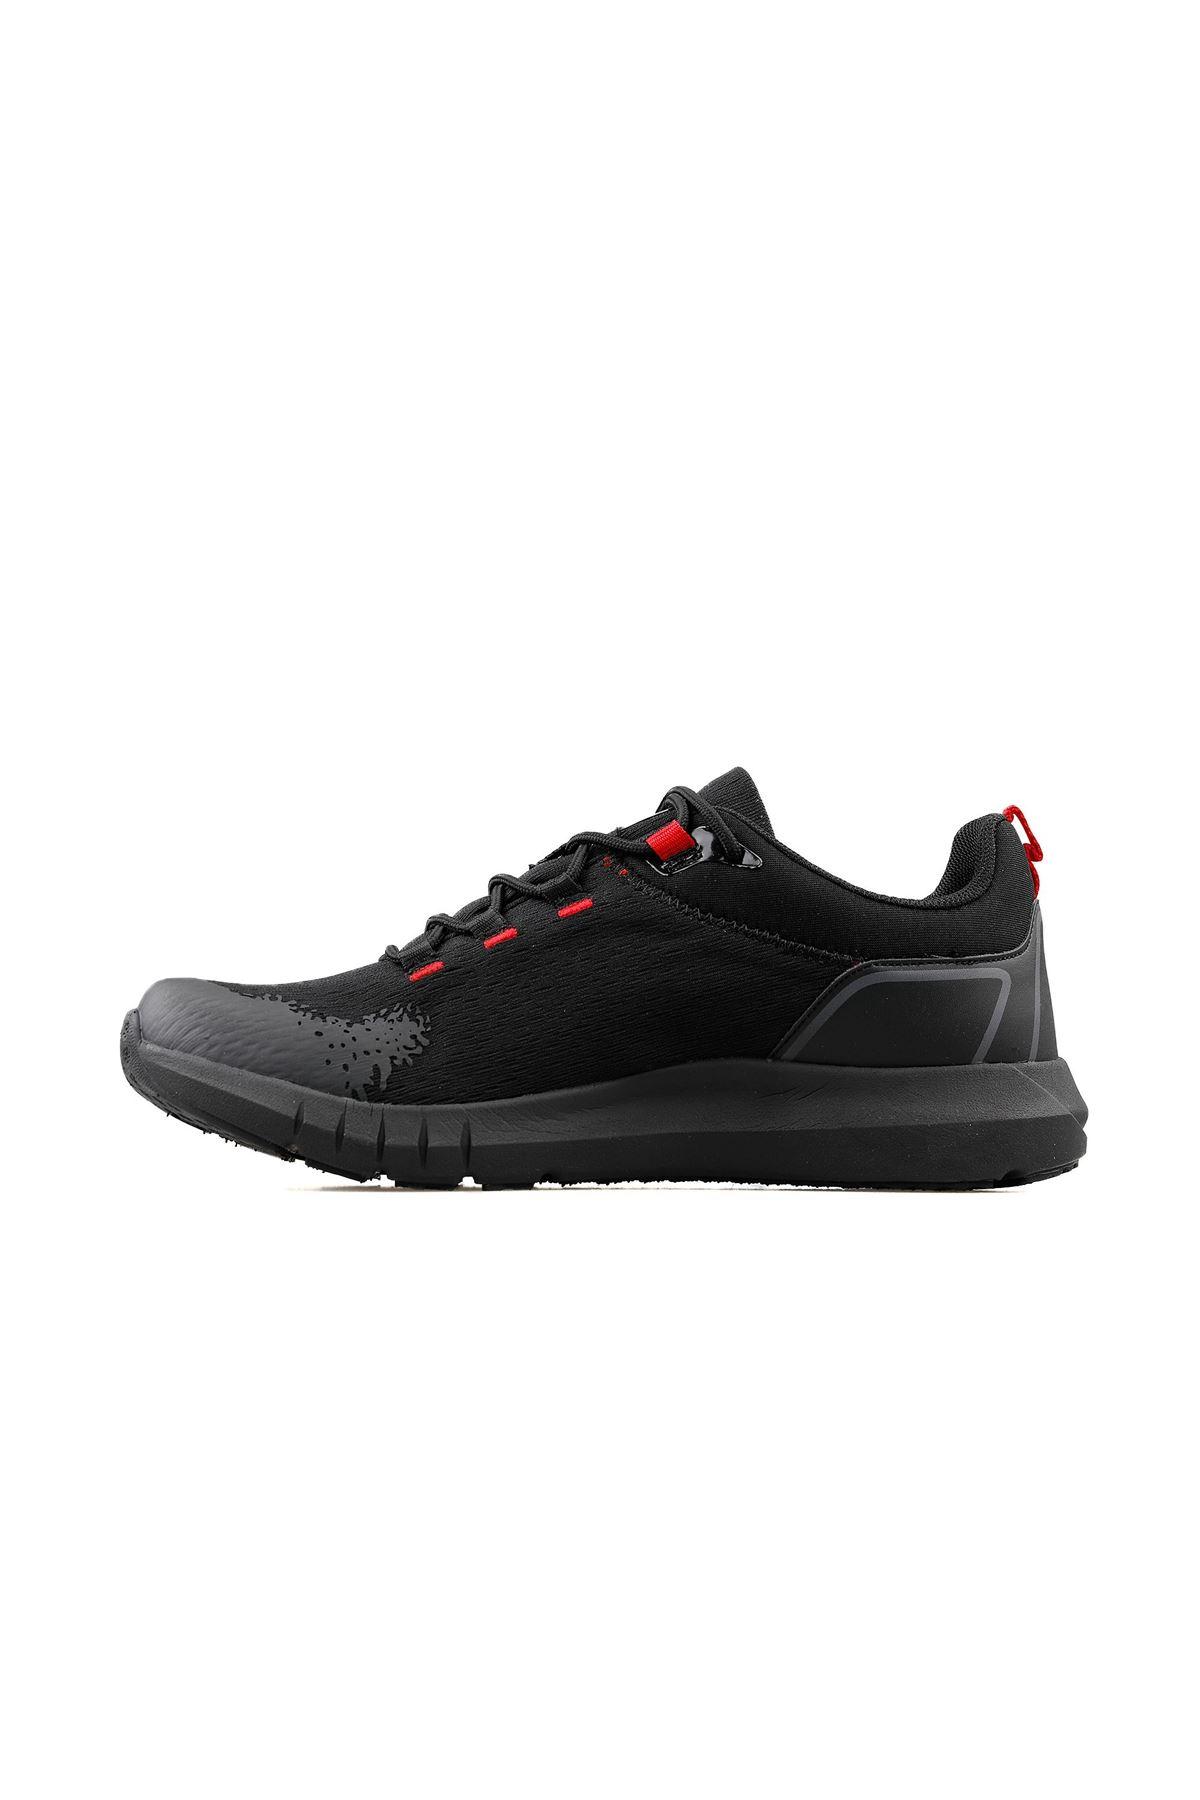 Jump Fileli Rahat Erkek Spor Ayakkabı SİYAH 26402